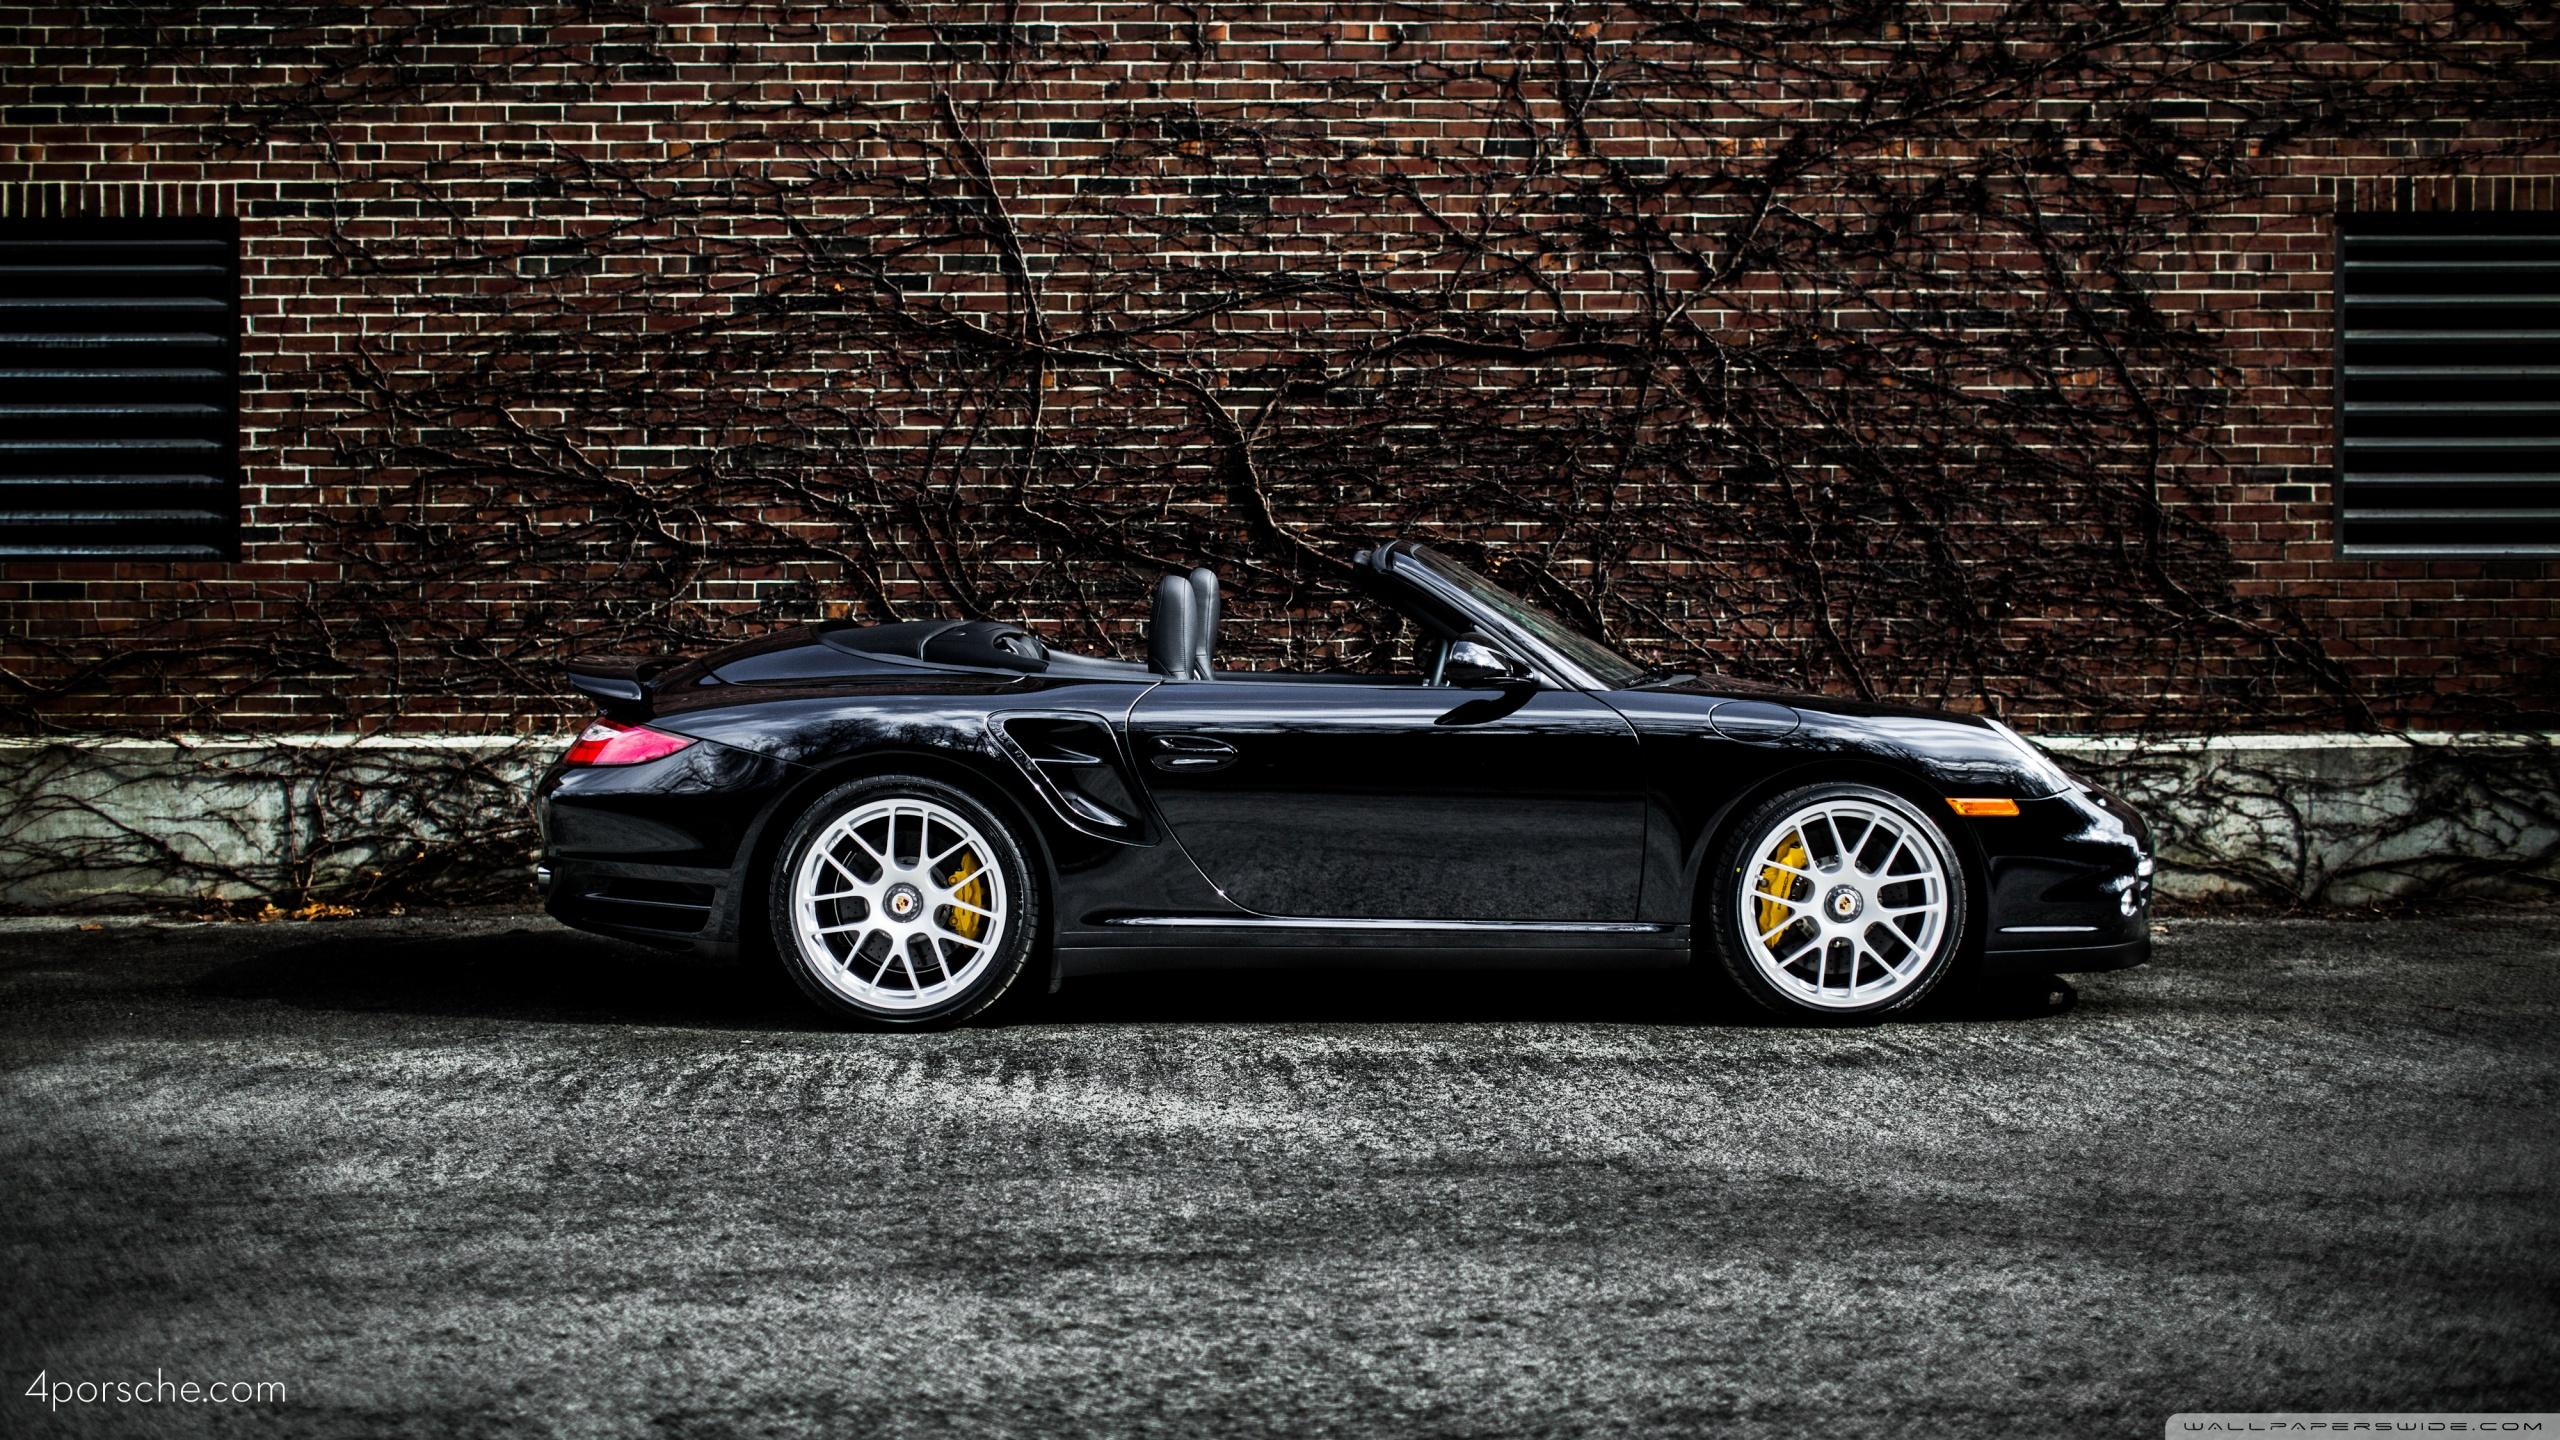 Black 2012 Porsche 911 997 Turbo S Cabriolet by a brick wall 2560x1440